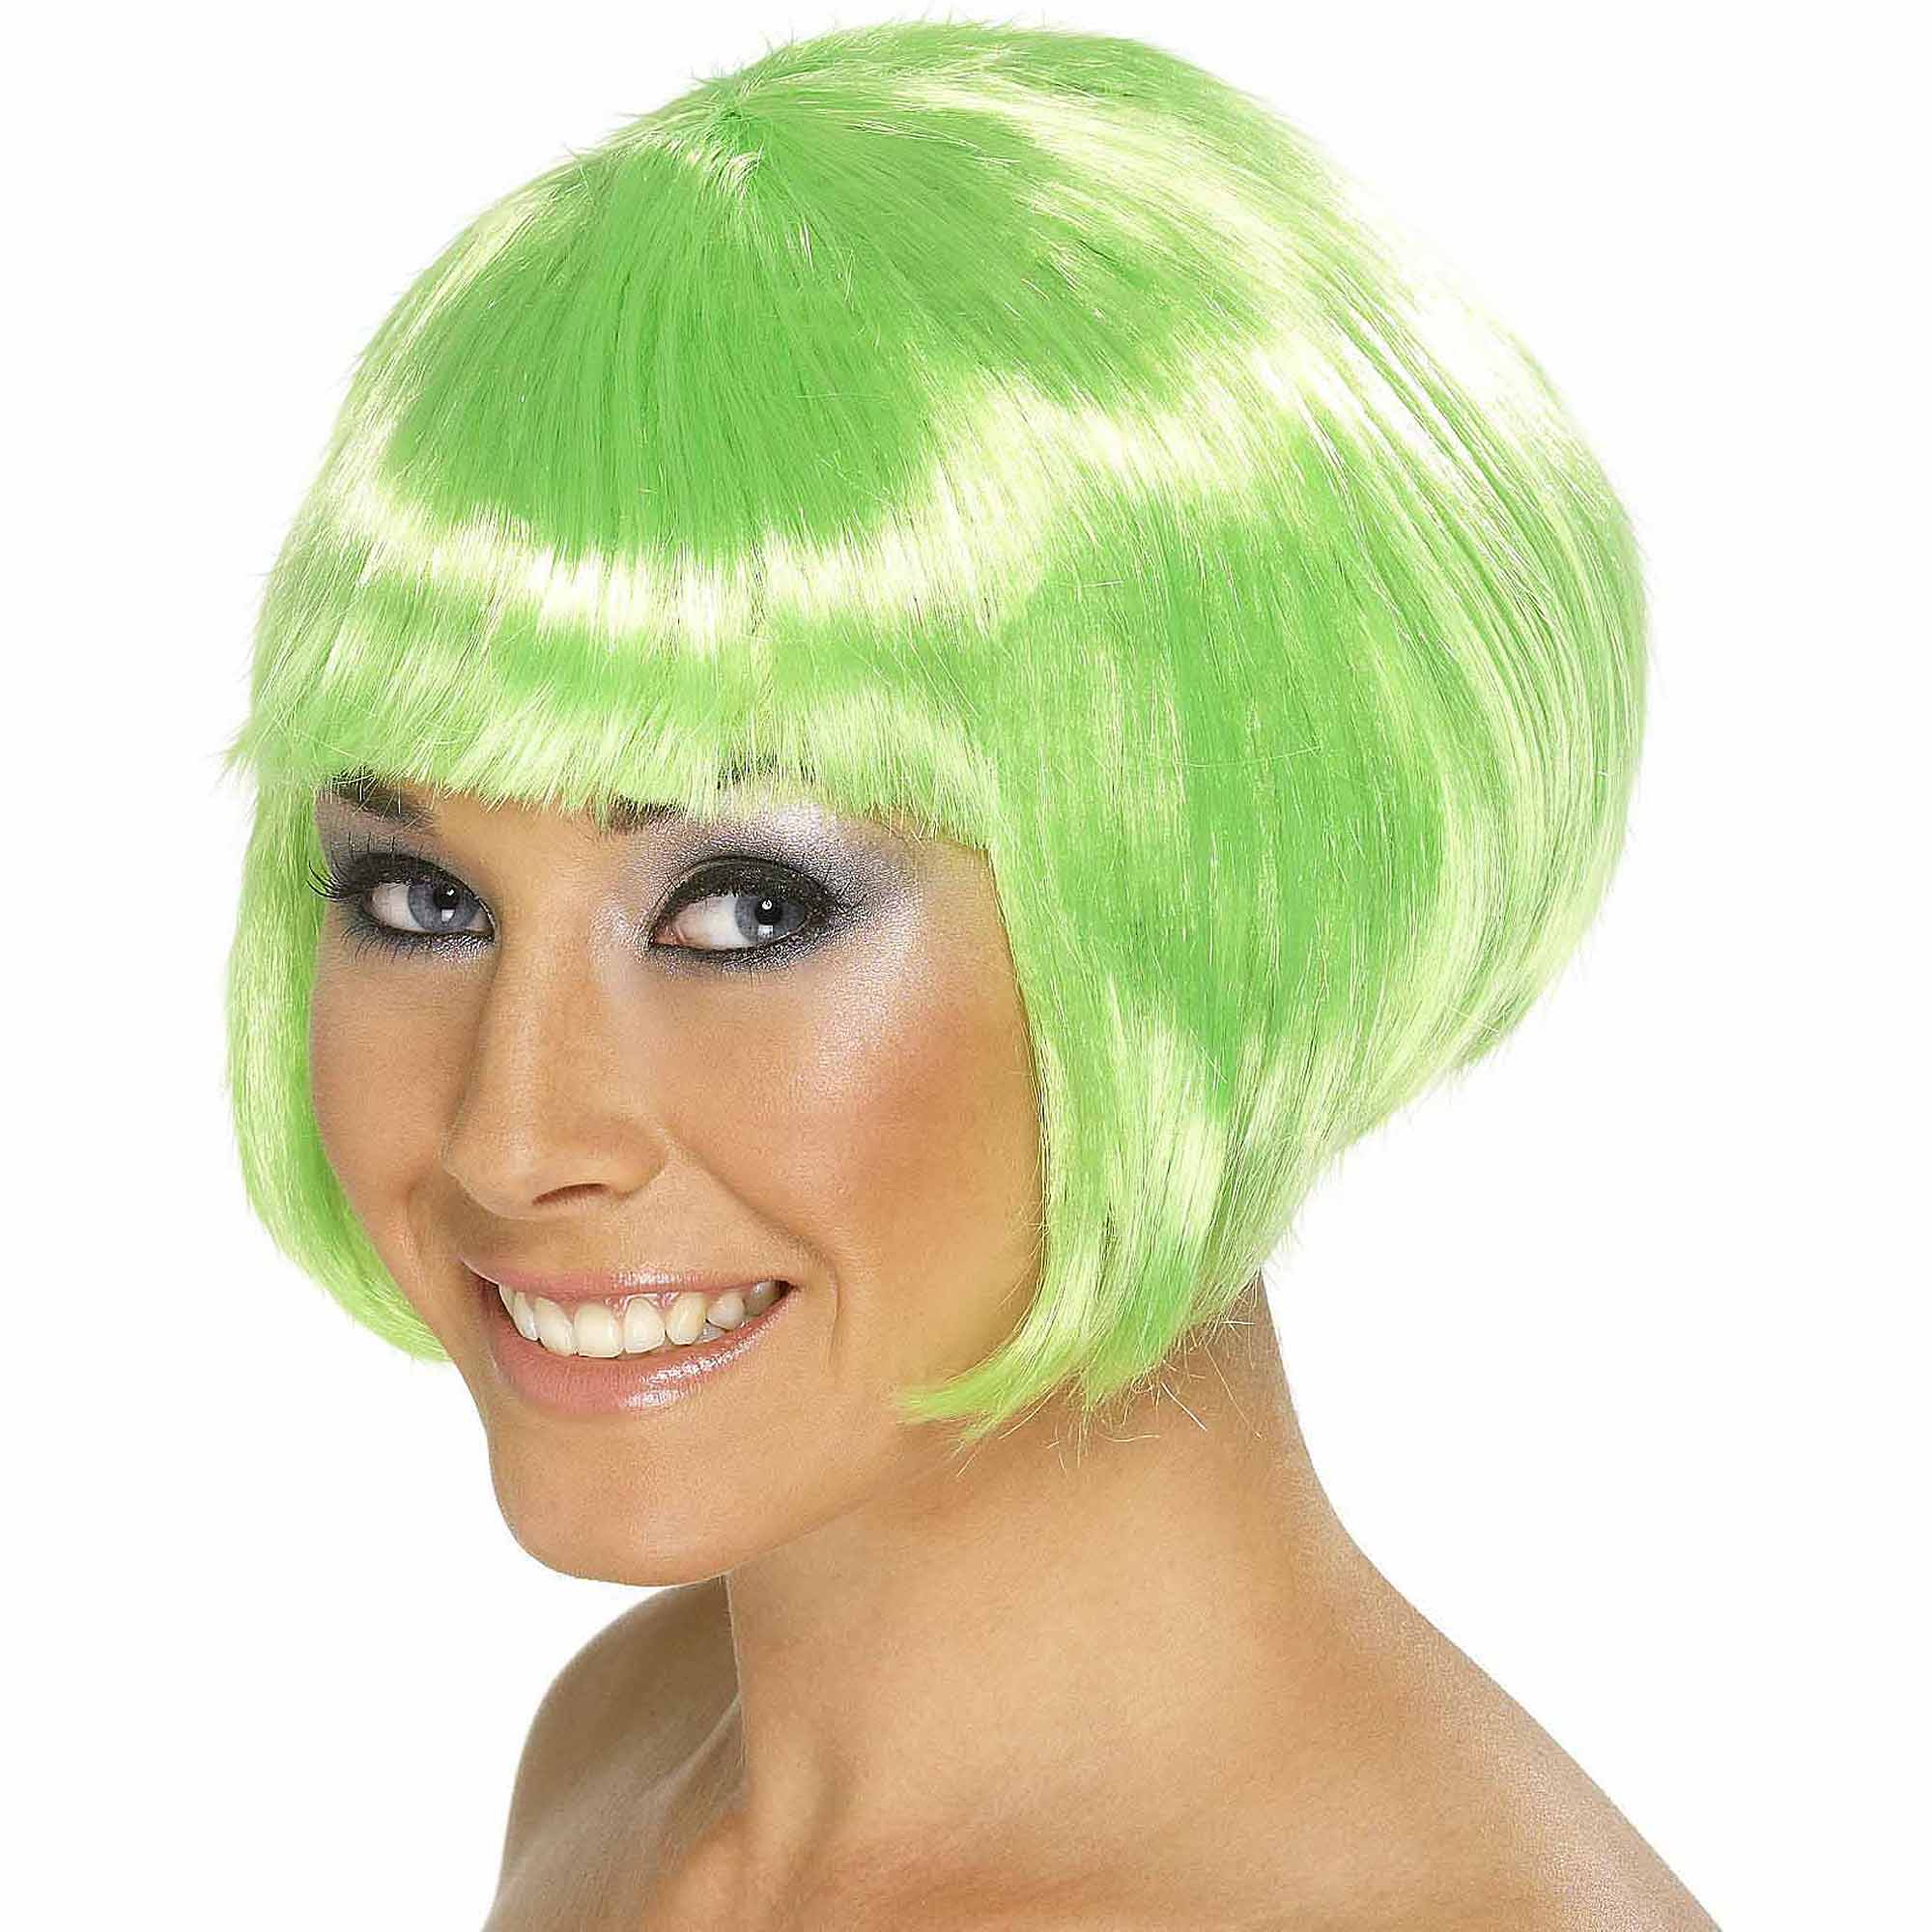 Short Bob Green Wig Adult Halloween Accessory